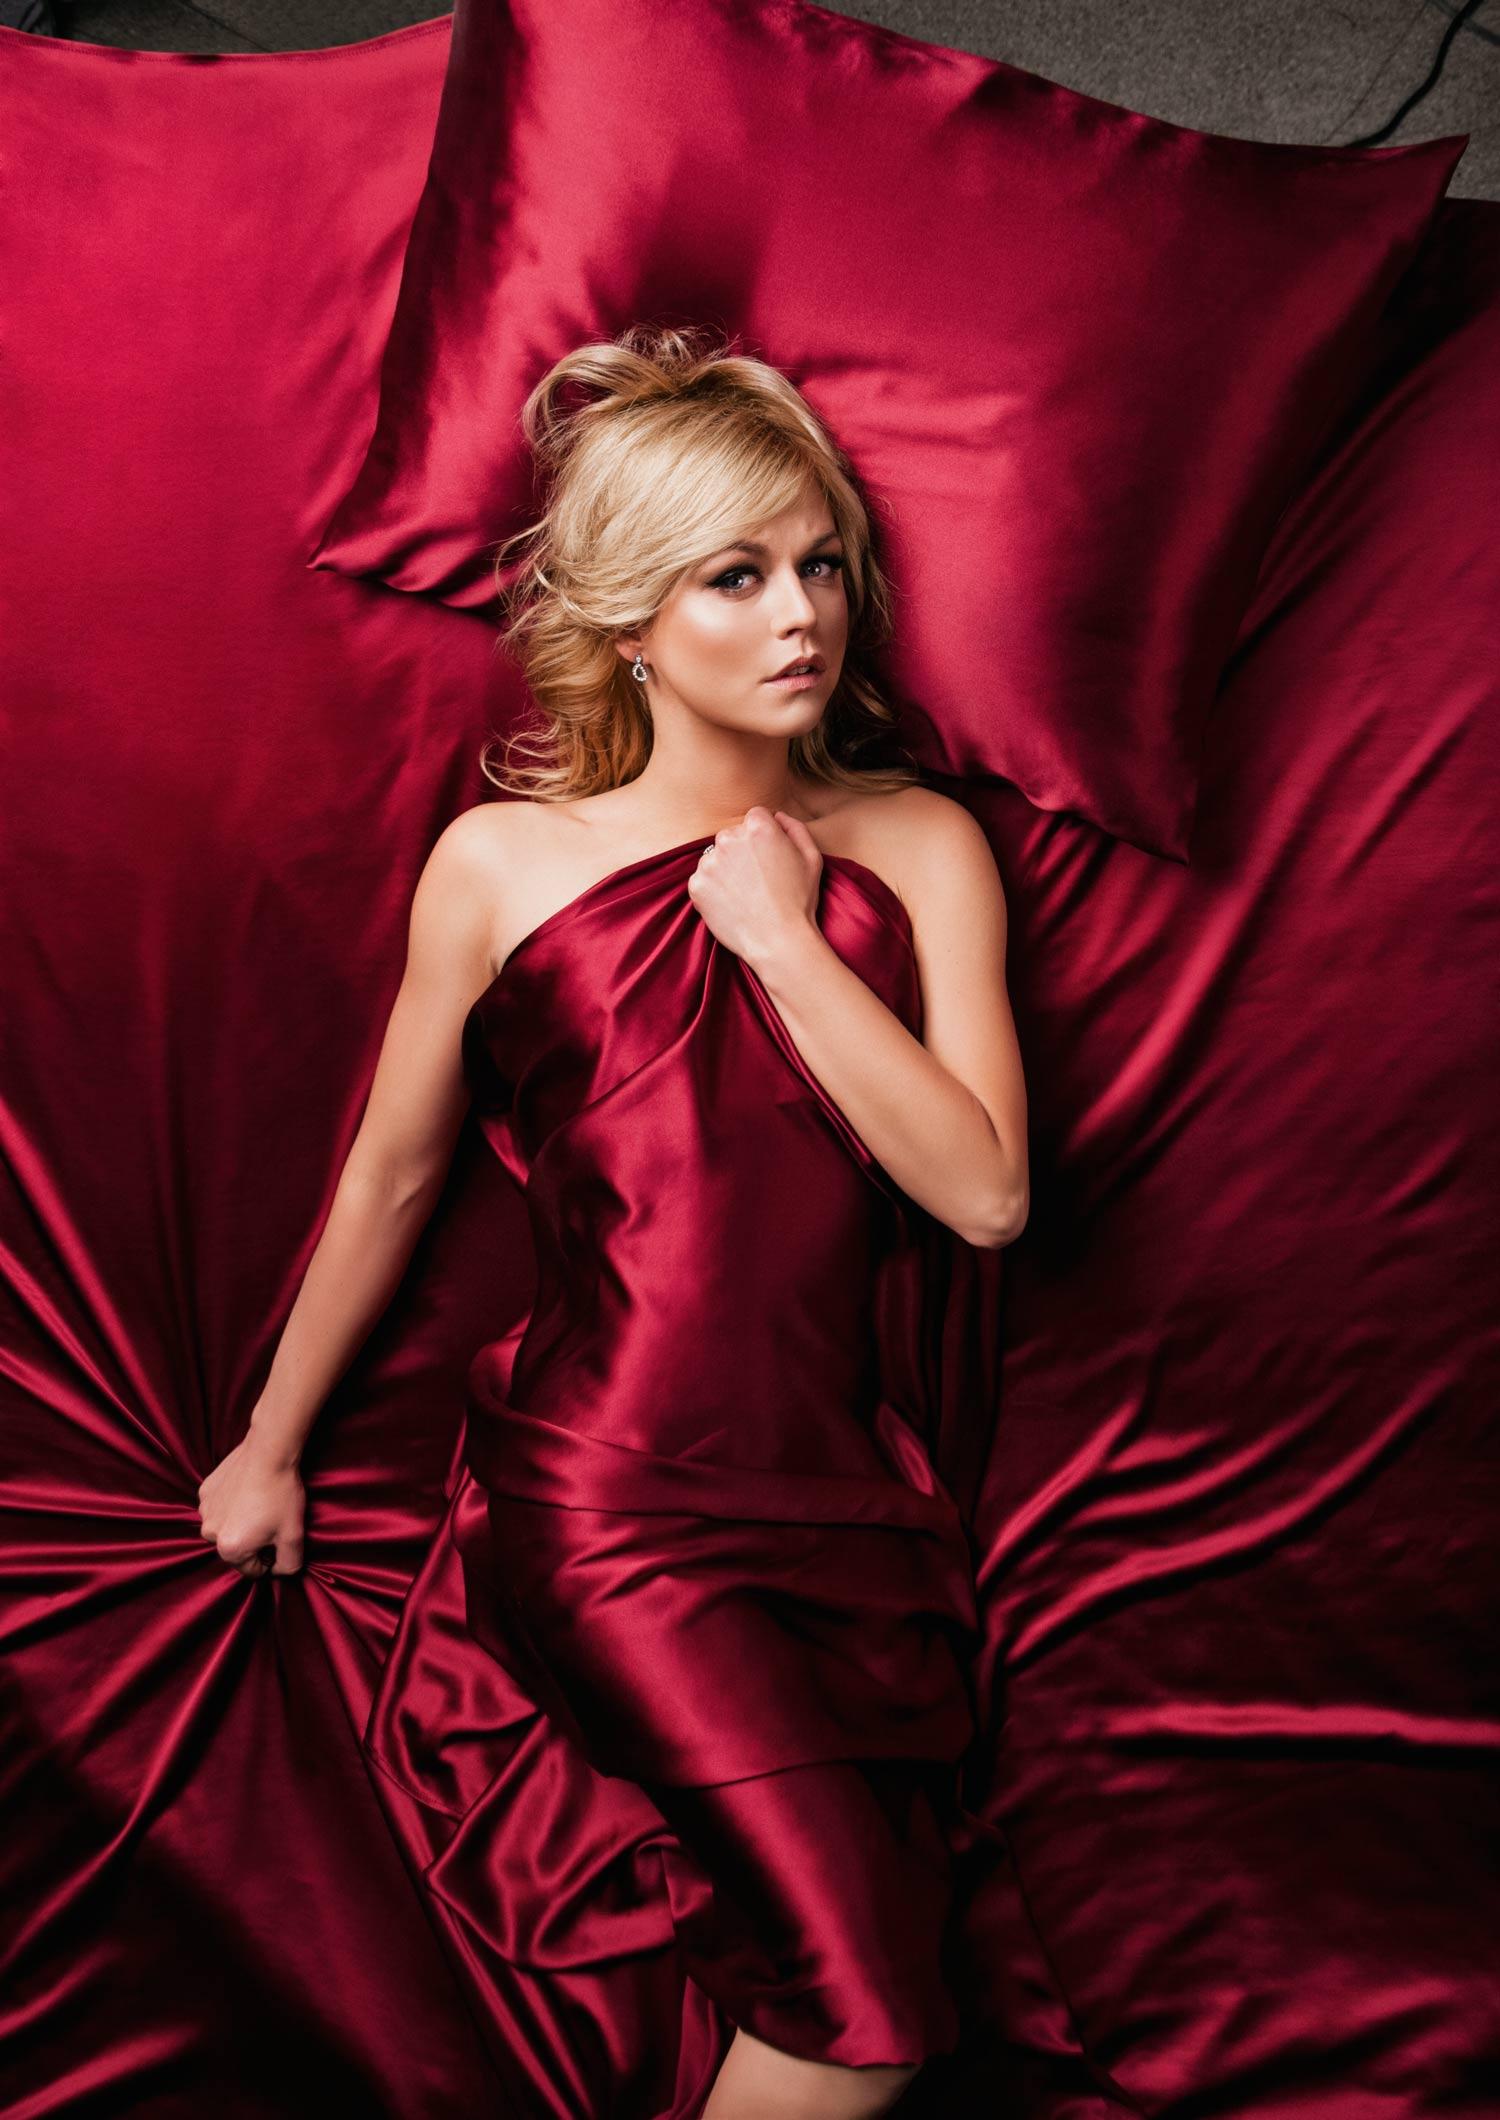 "<p>Toma Vaškevičiūtė<br /> Actress<br /> Tv series poster<br /> ""All men are pigs""<br /> Lithuania<br /> 2015</p>"